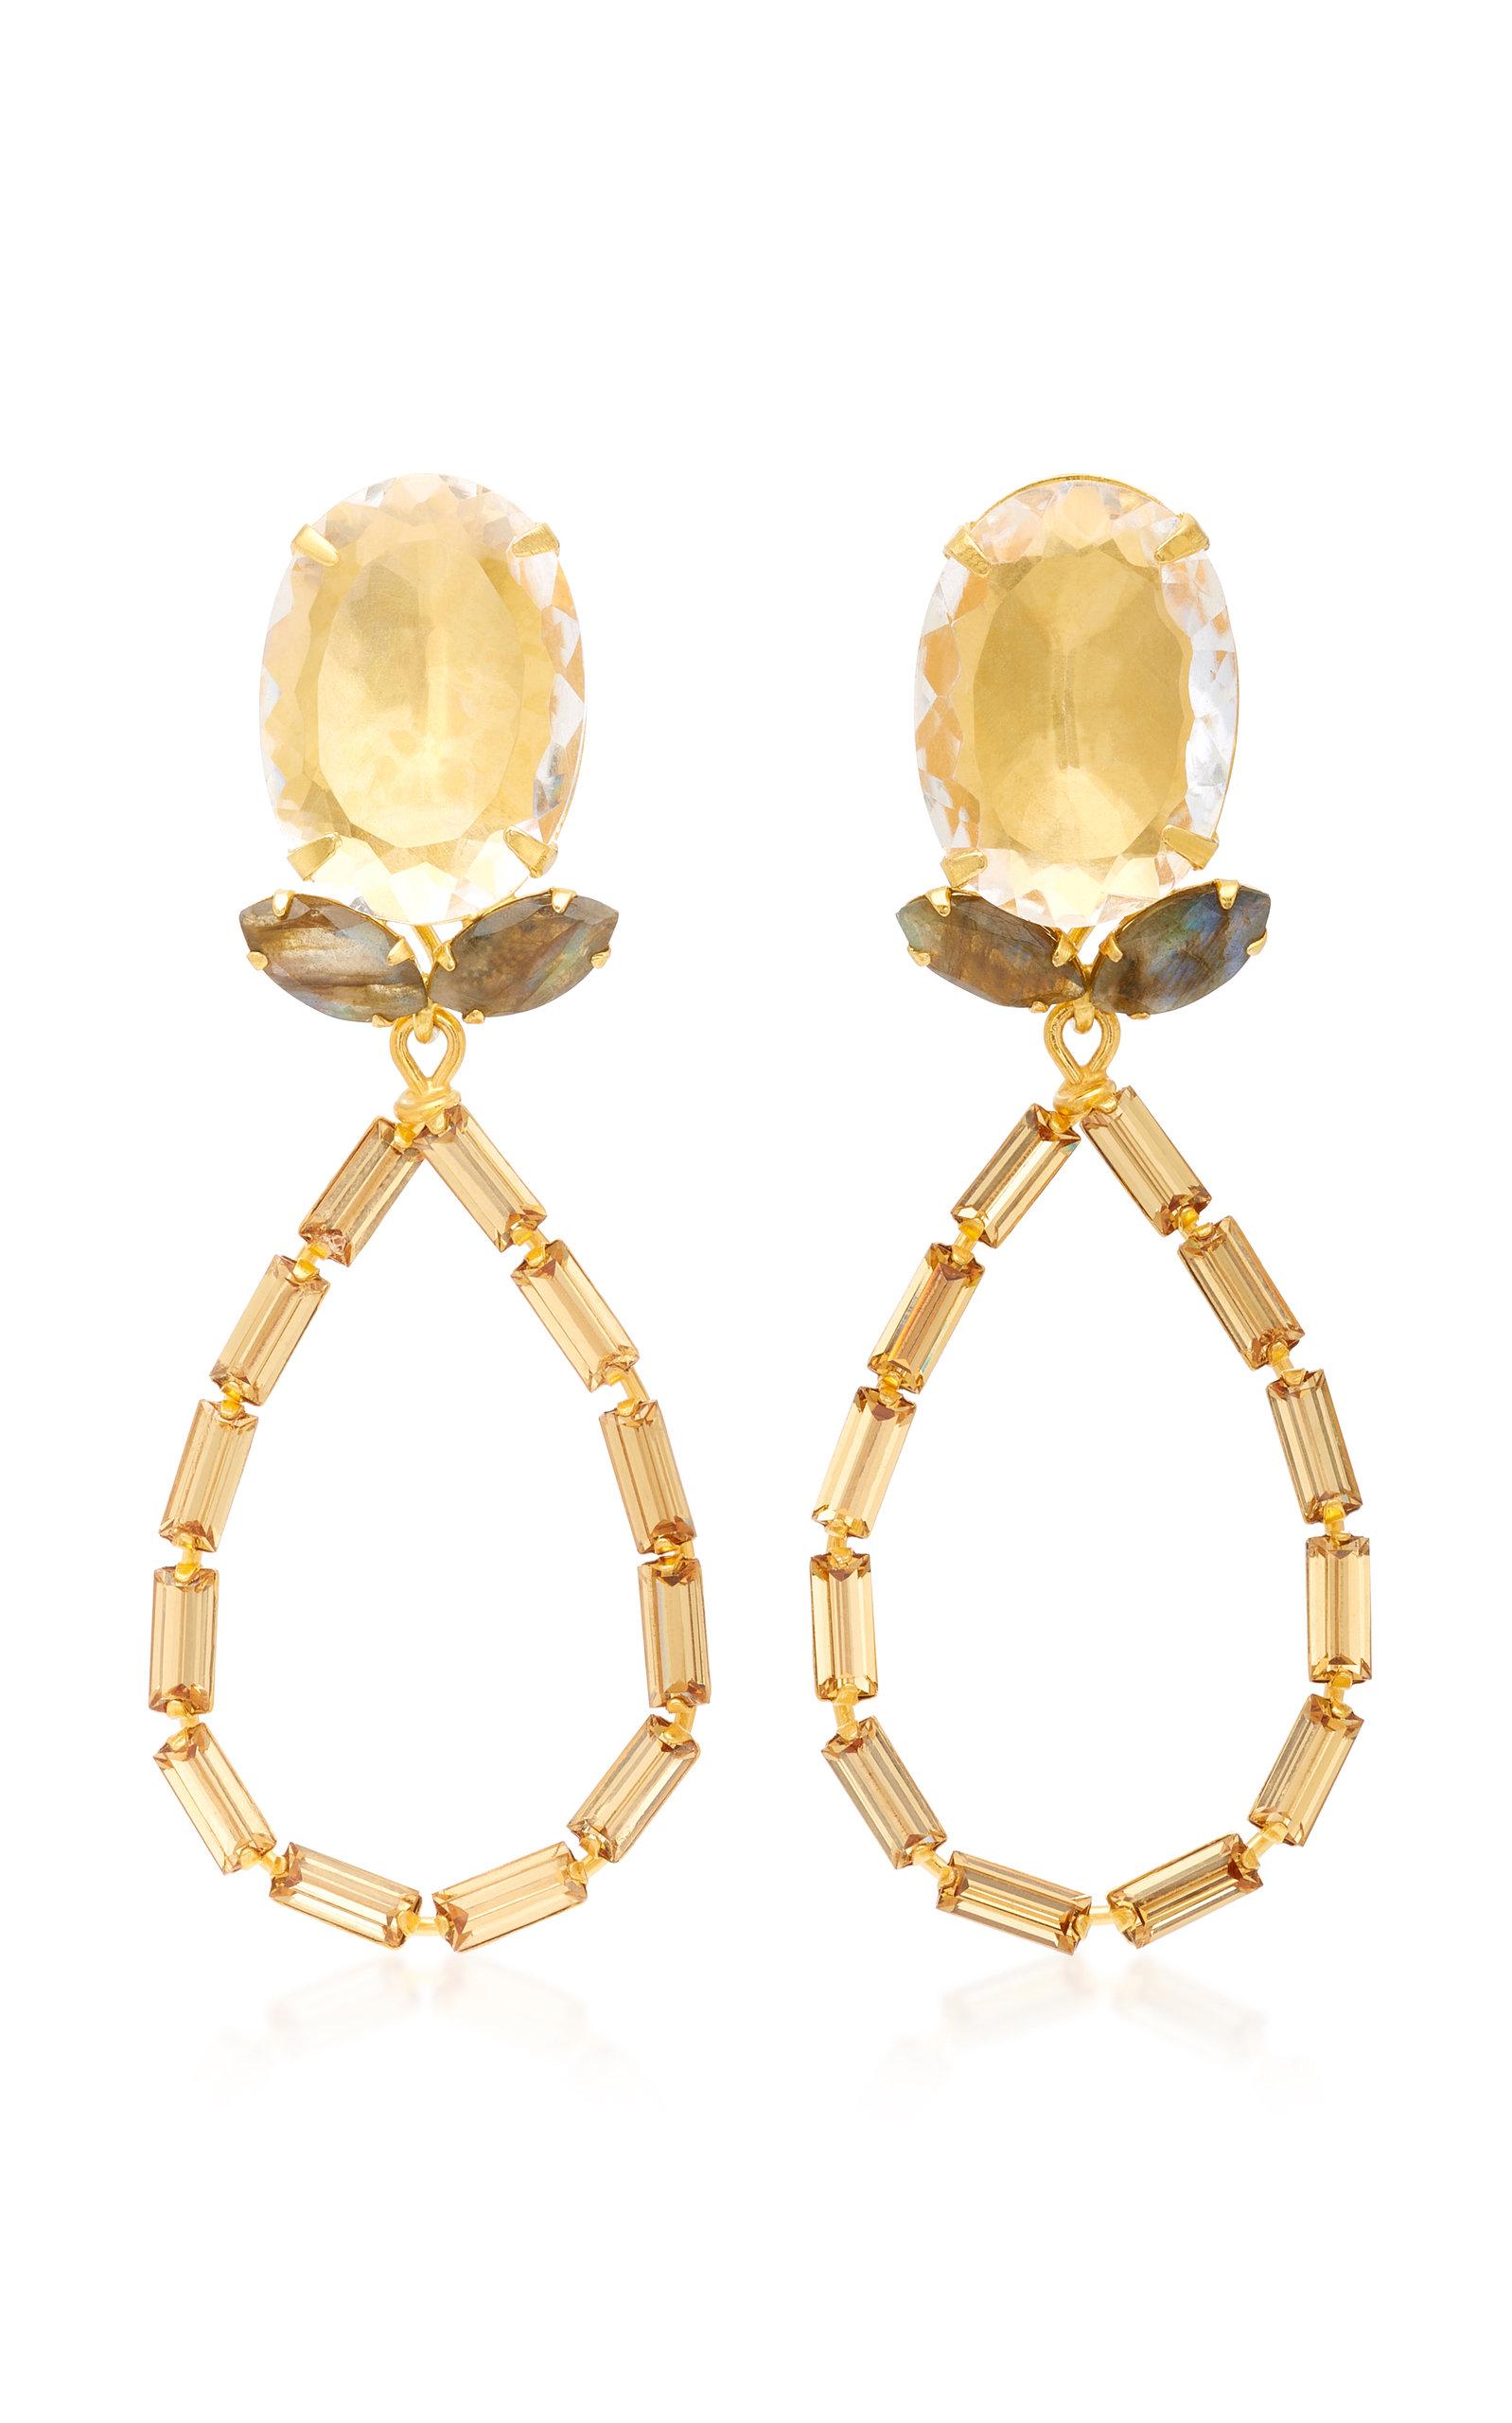 BOUNKIT QUARTZ LABRADORITE AND BAGUETTE TEARDROP 14K GOLD-PLATED BRASS EARRINGS